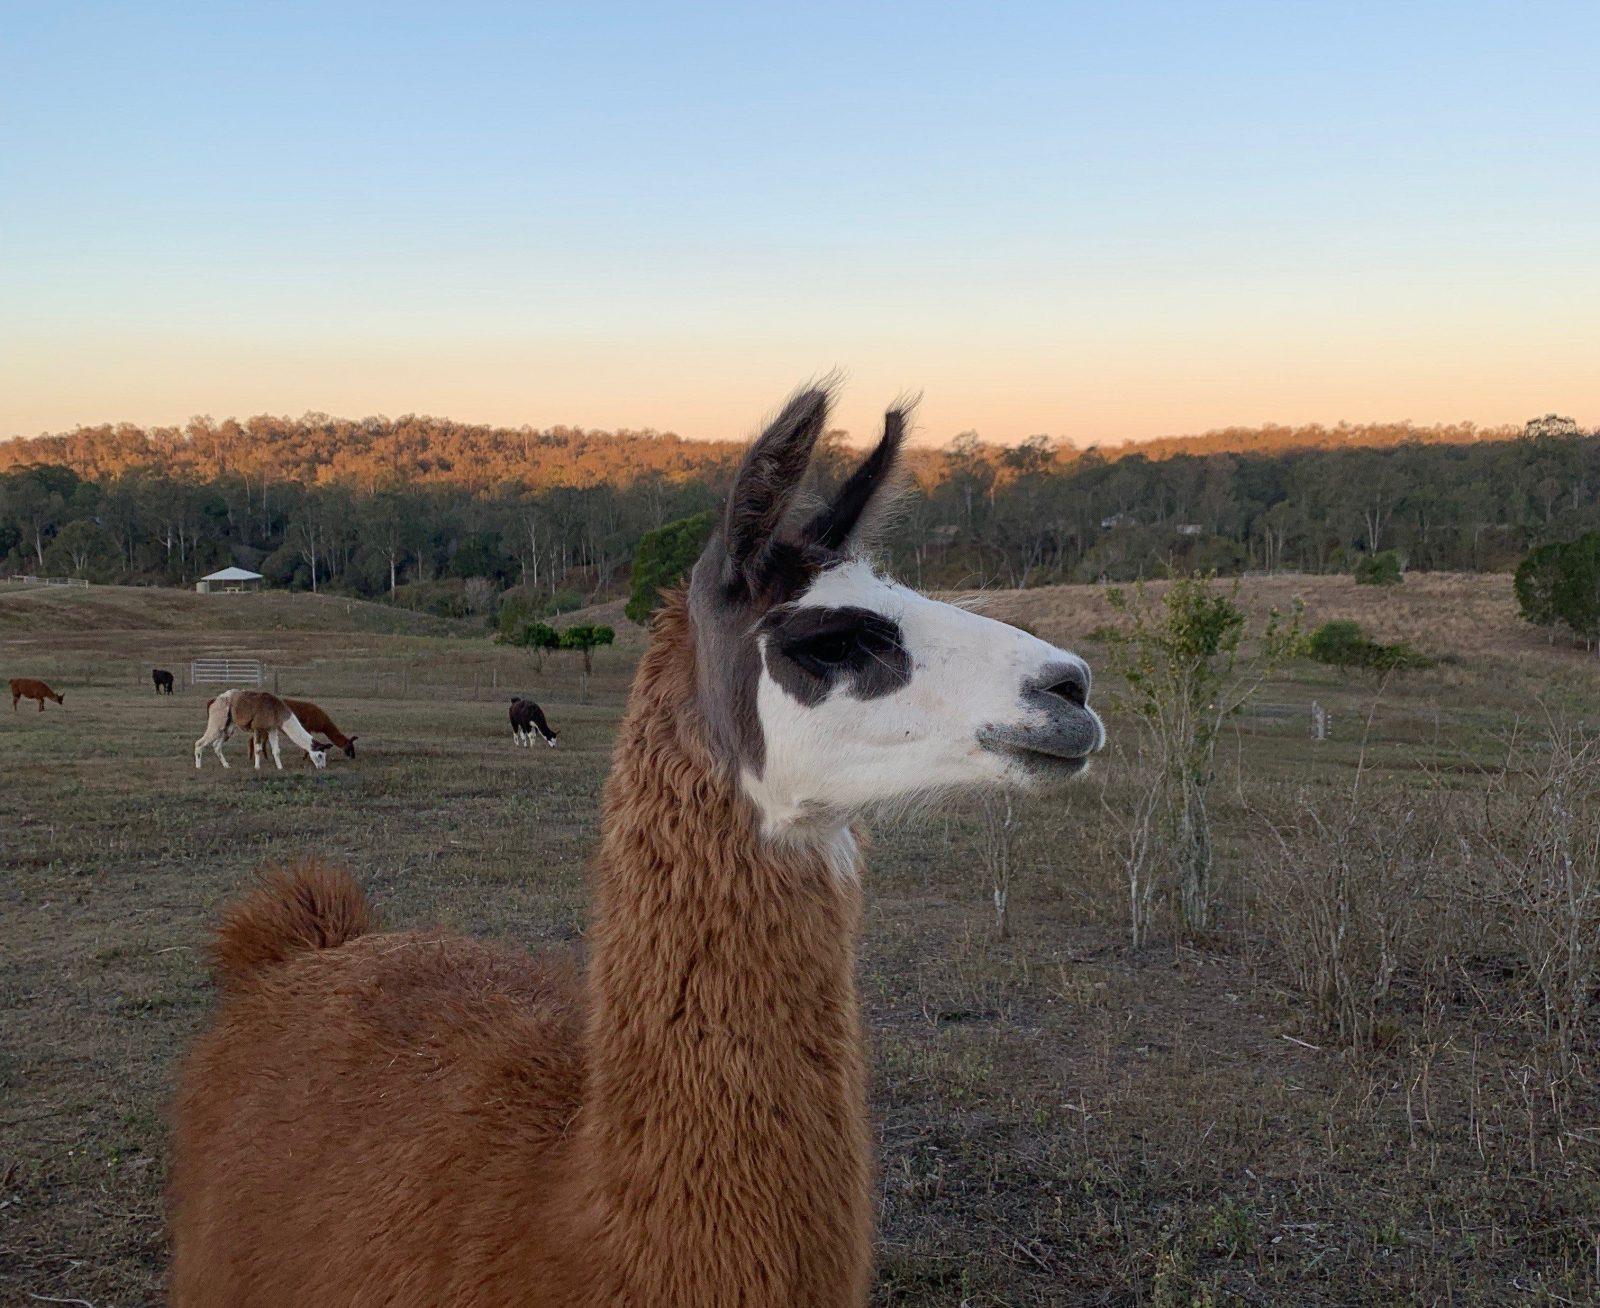 The Llama Farm